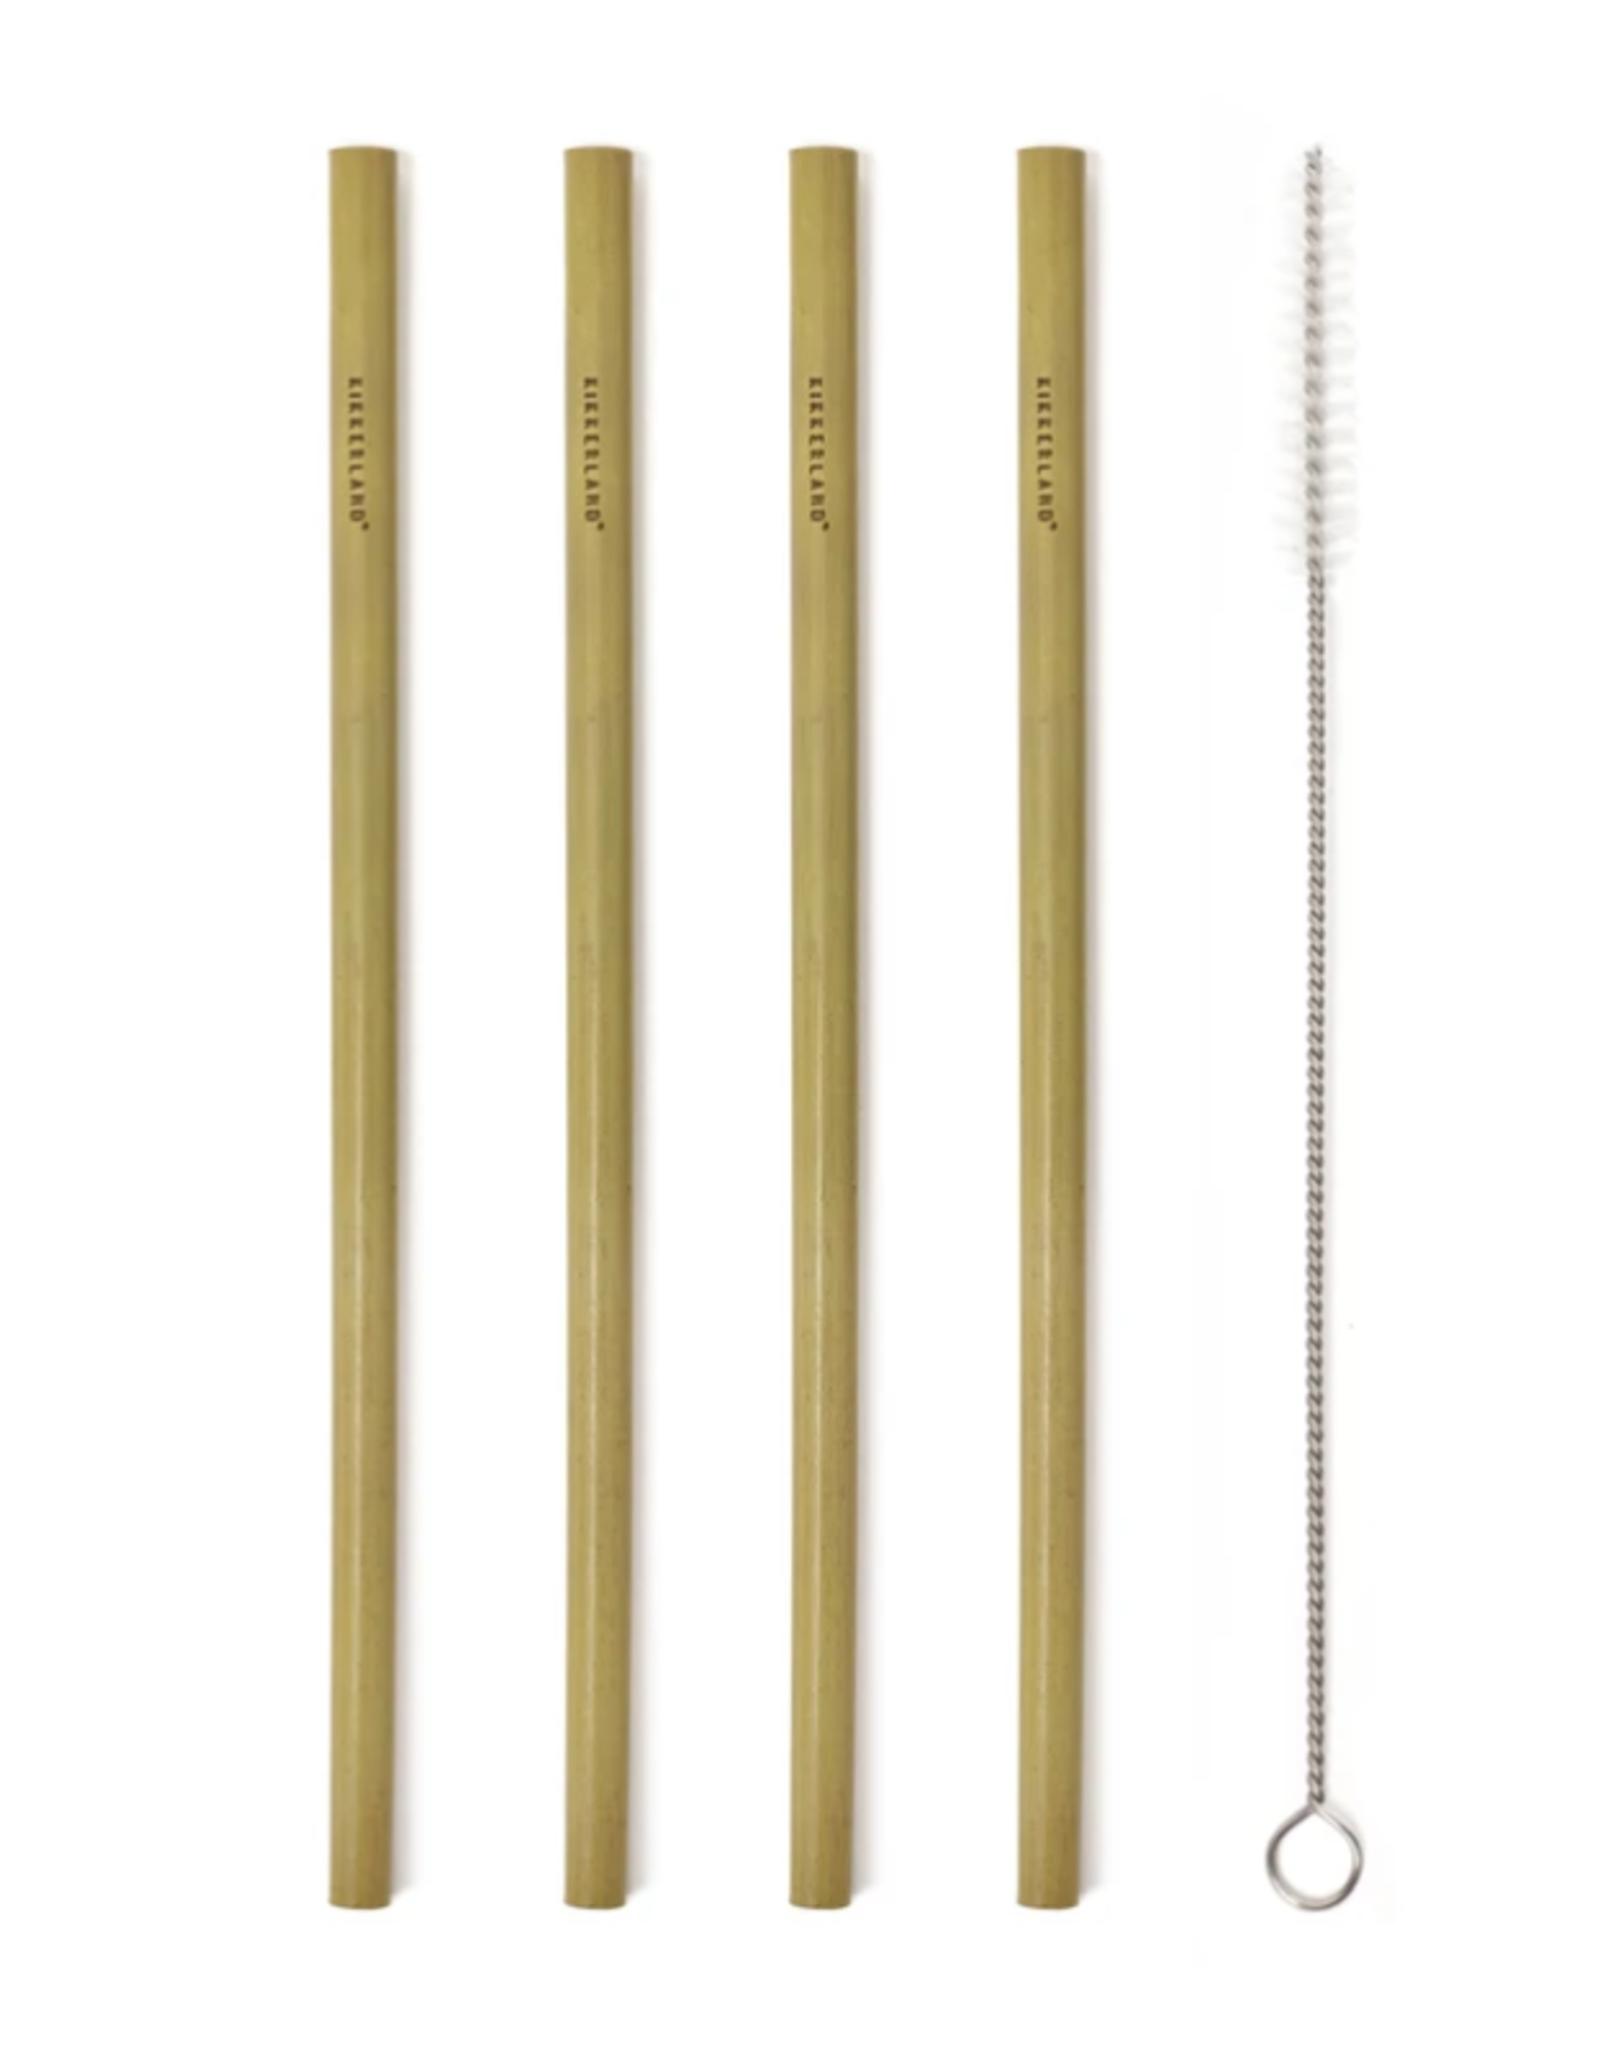 Kikkerland Natural Bamboo Straws, Set 8